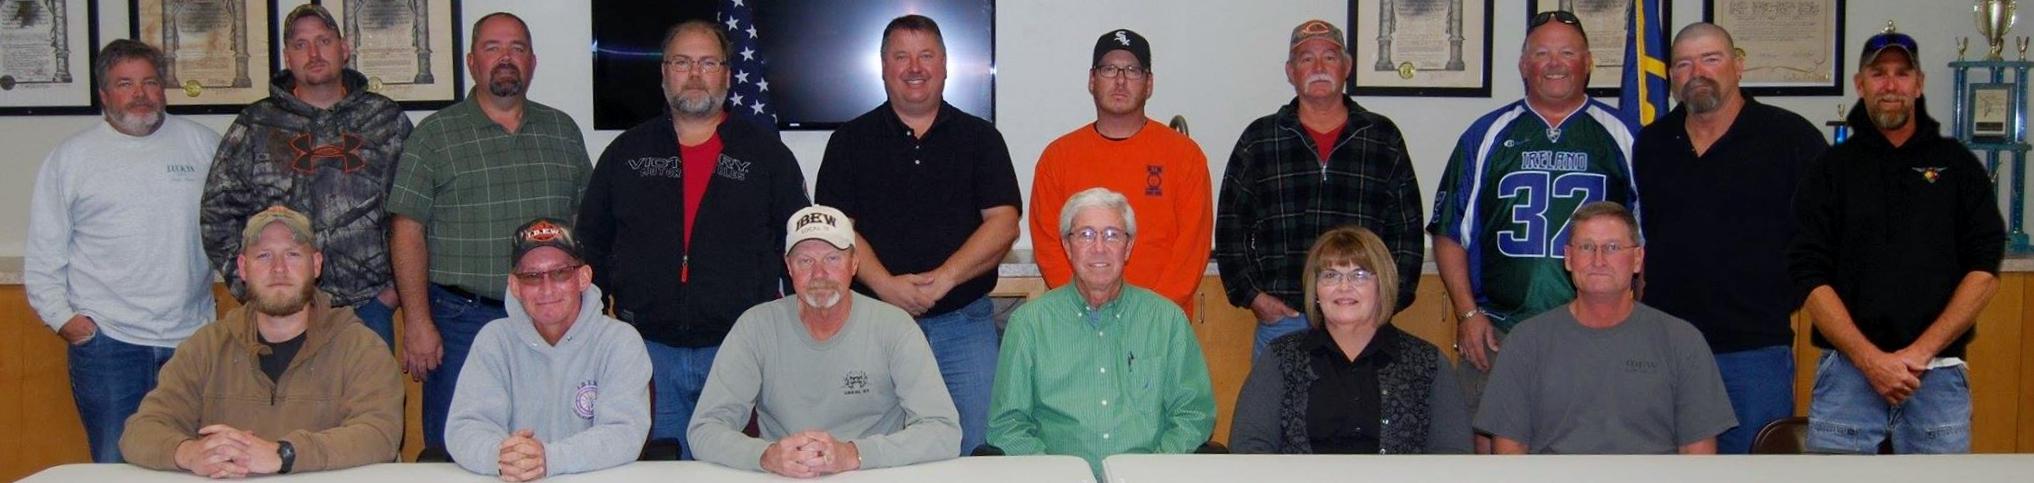 Local 51 Executive Board